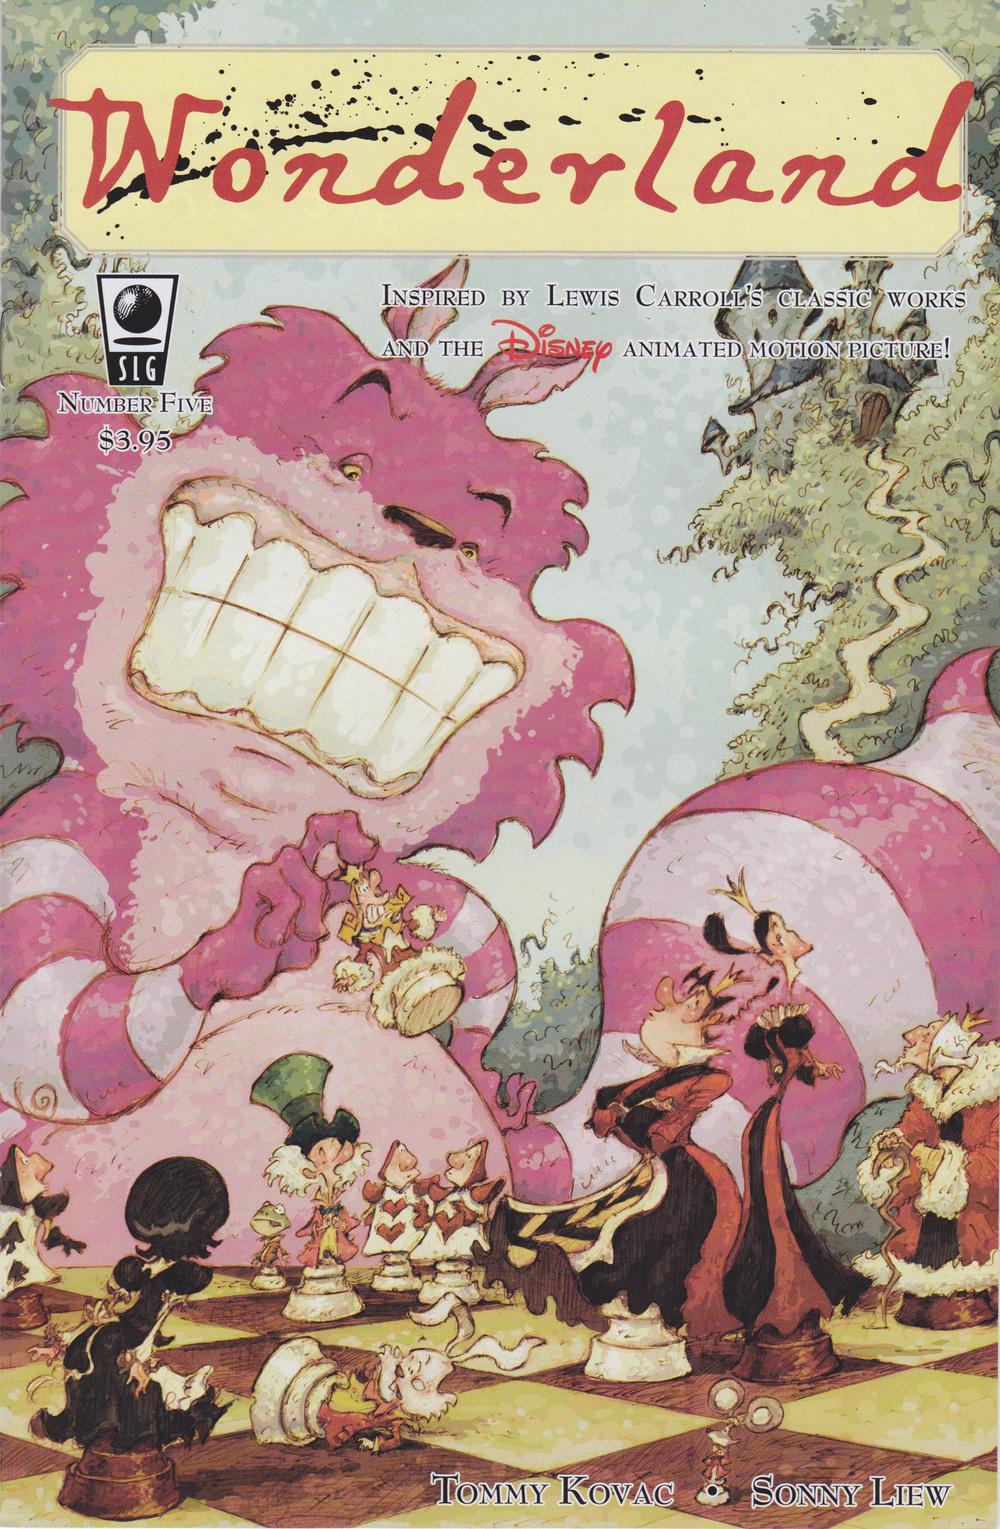 Wonderland 5 front cover.jpg